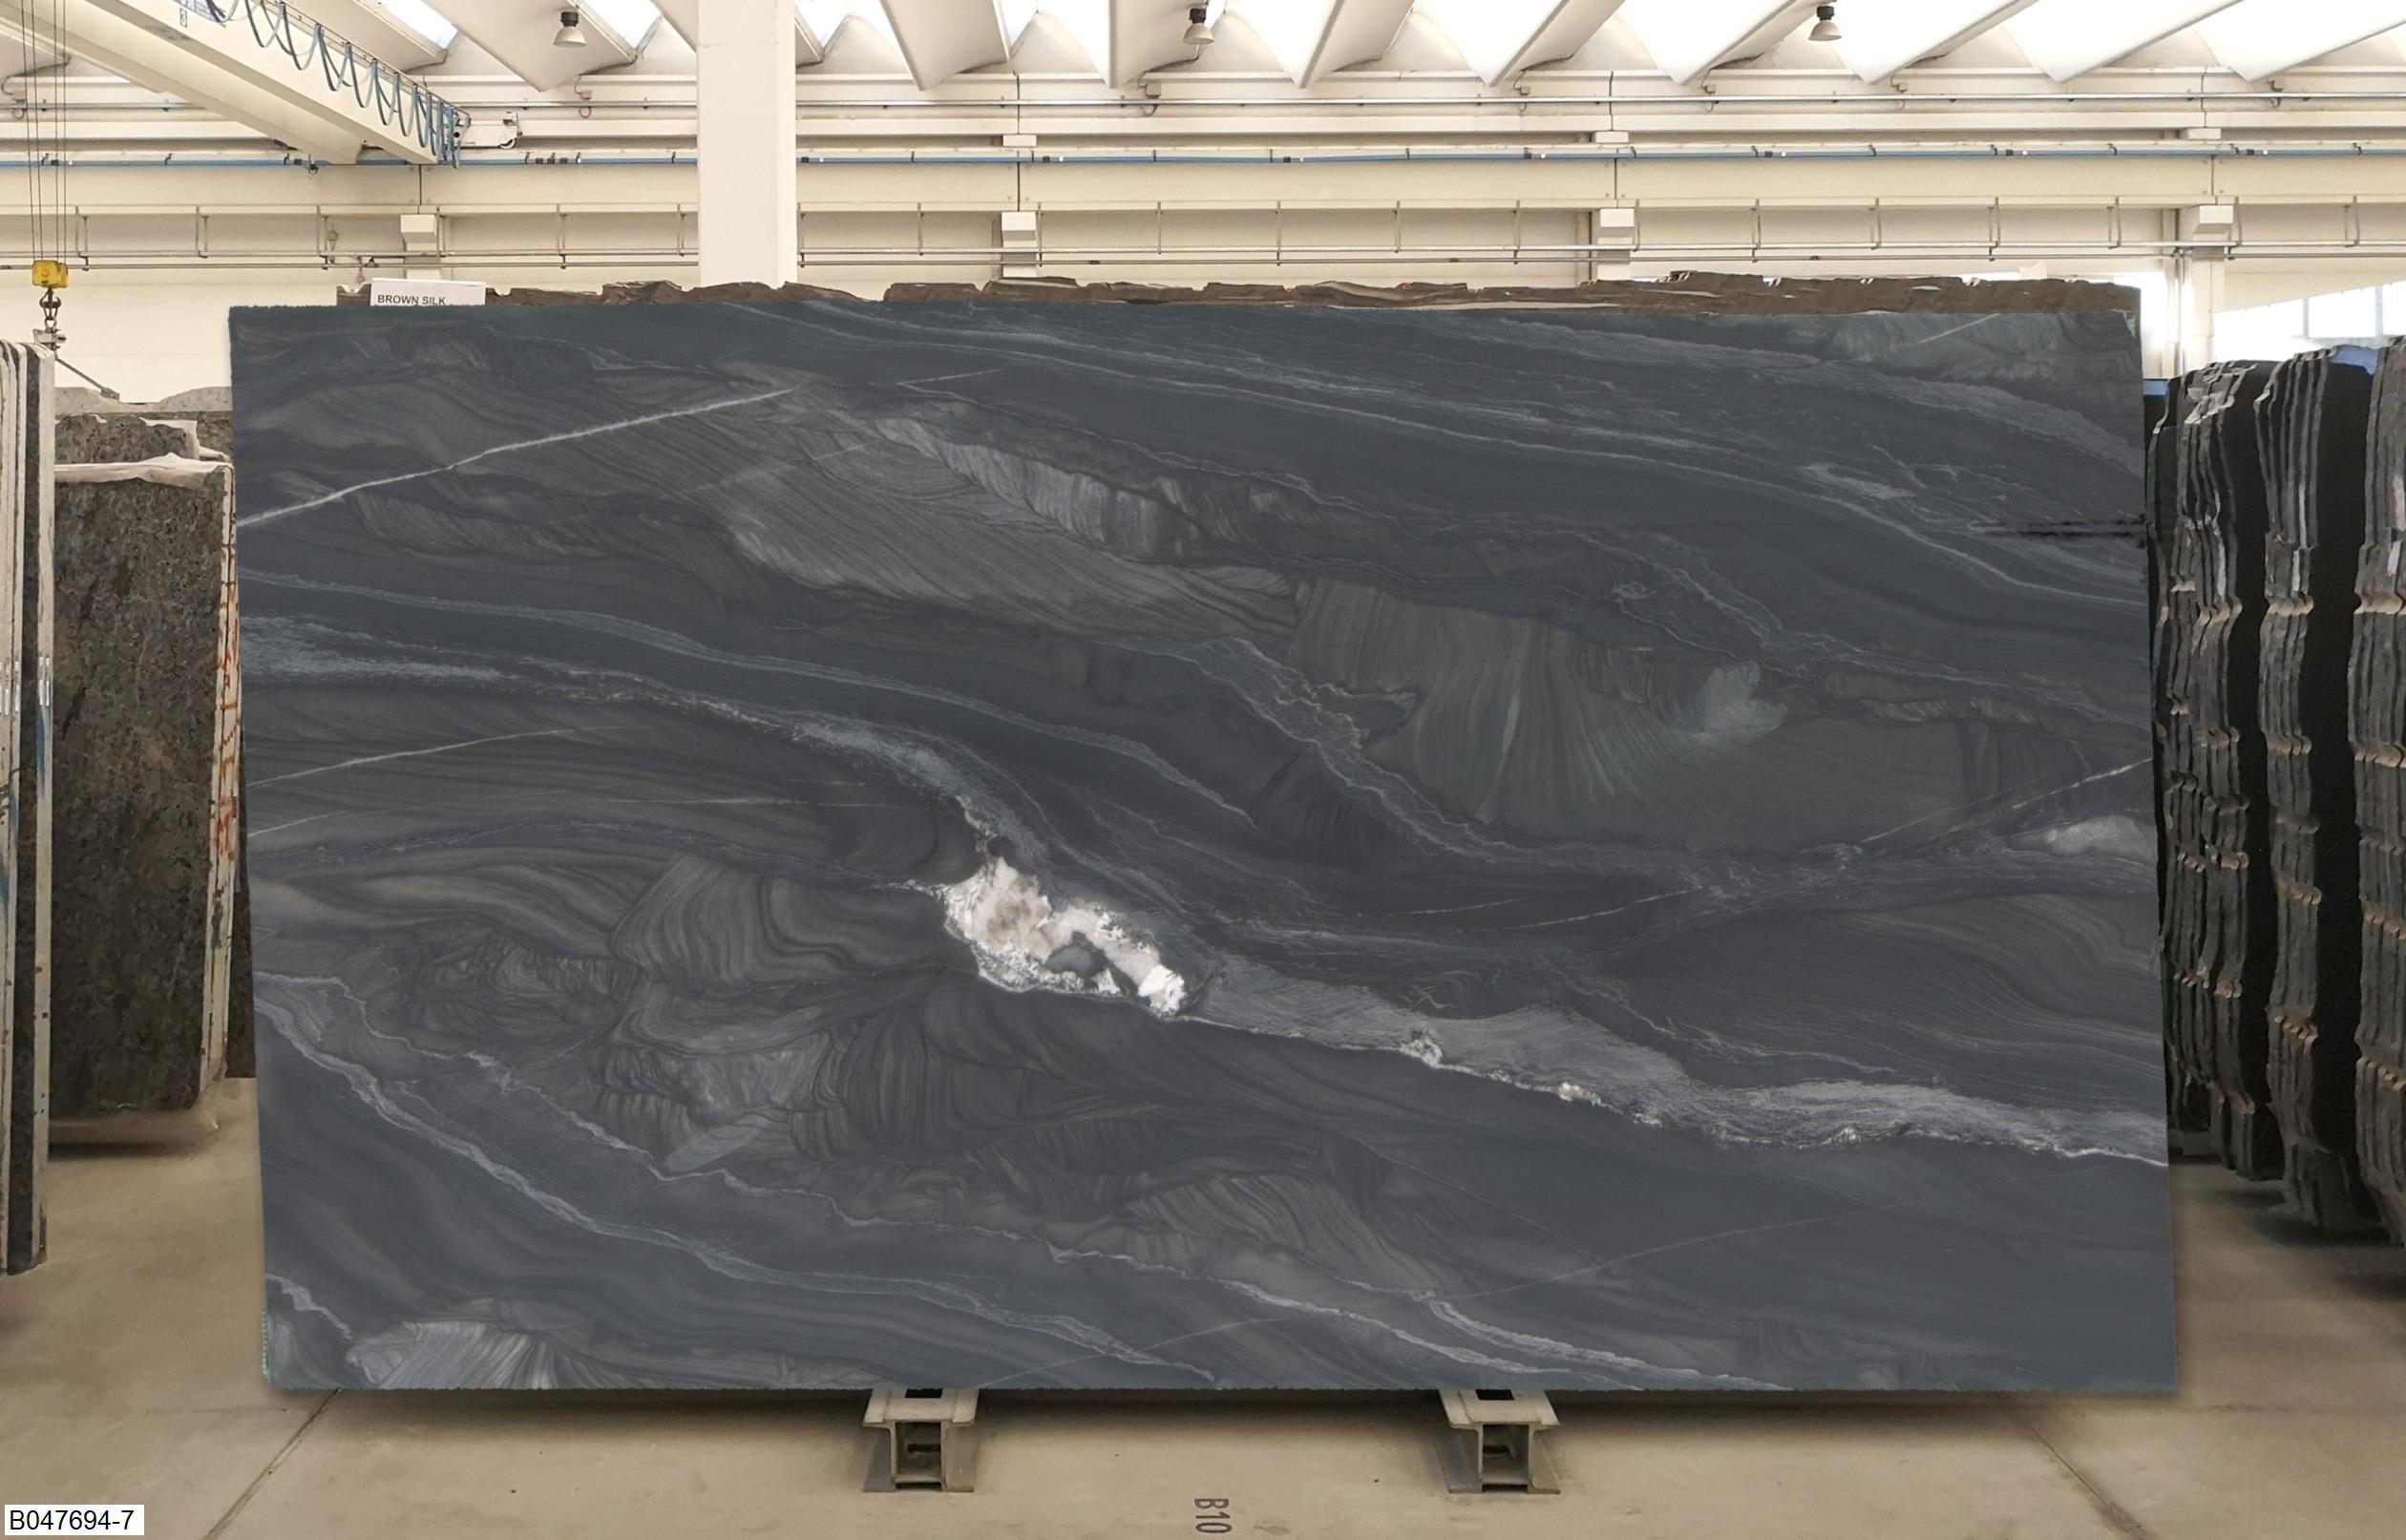 BLACK TEMPEST - LASTRE SATINATE-MACCHIA APERTA Foto: 1_59699_39242.jpg